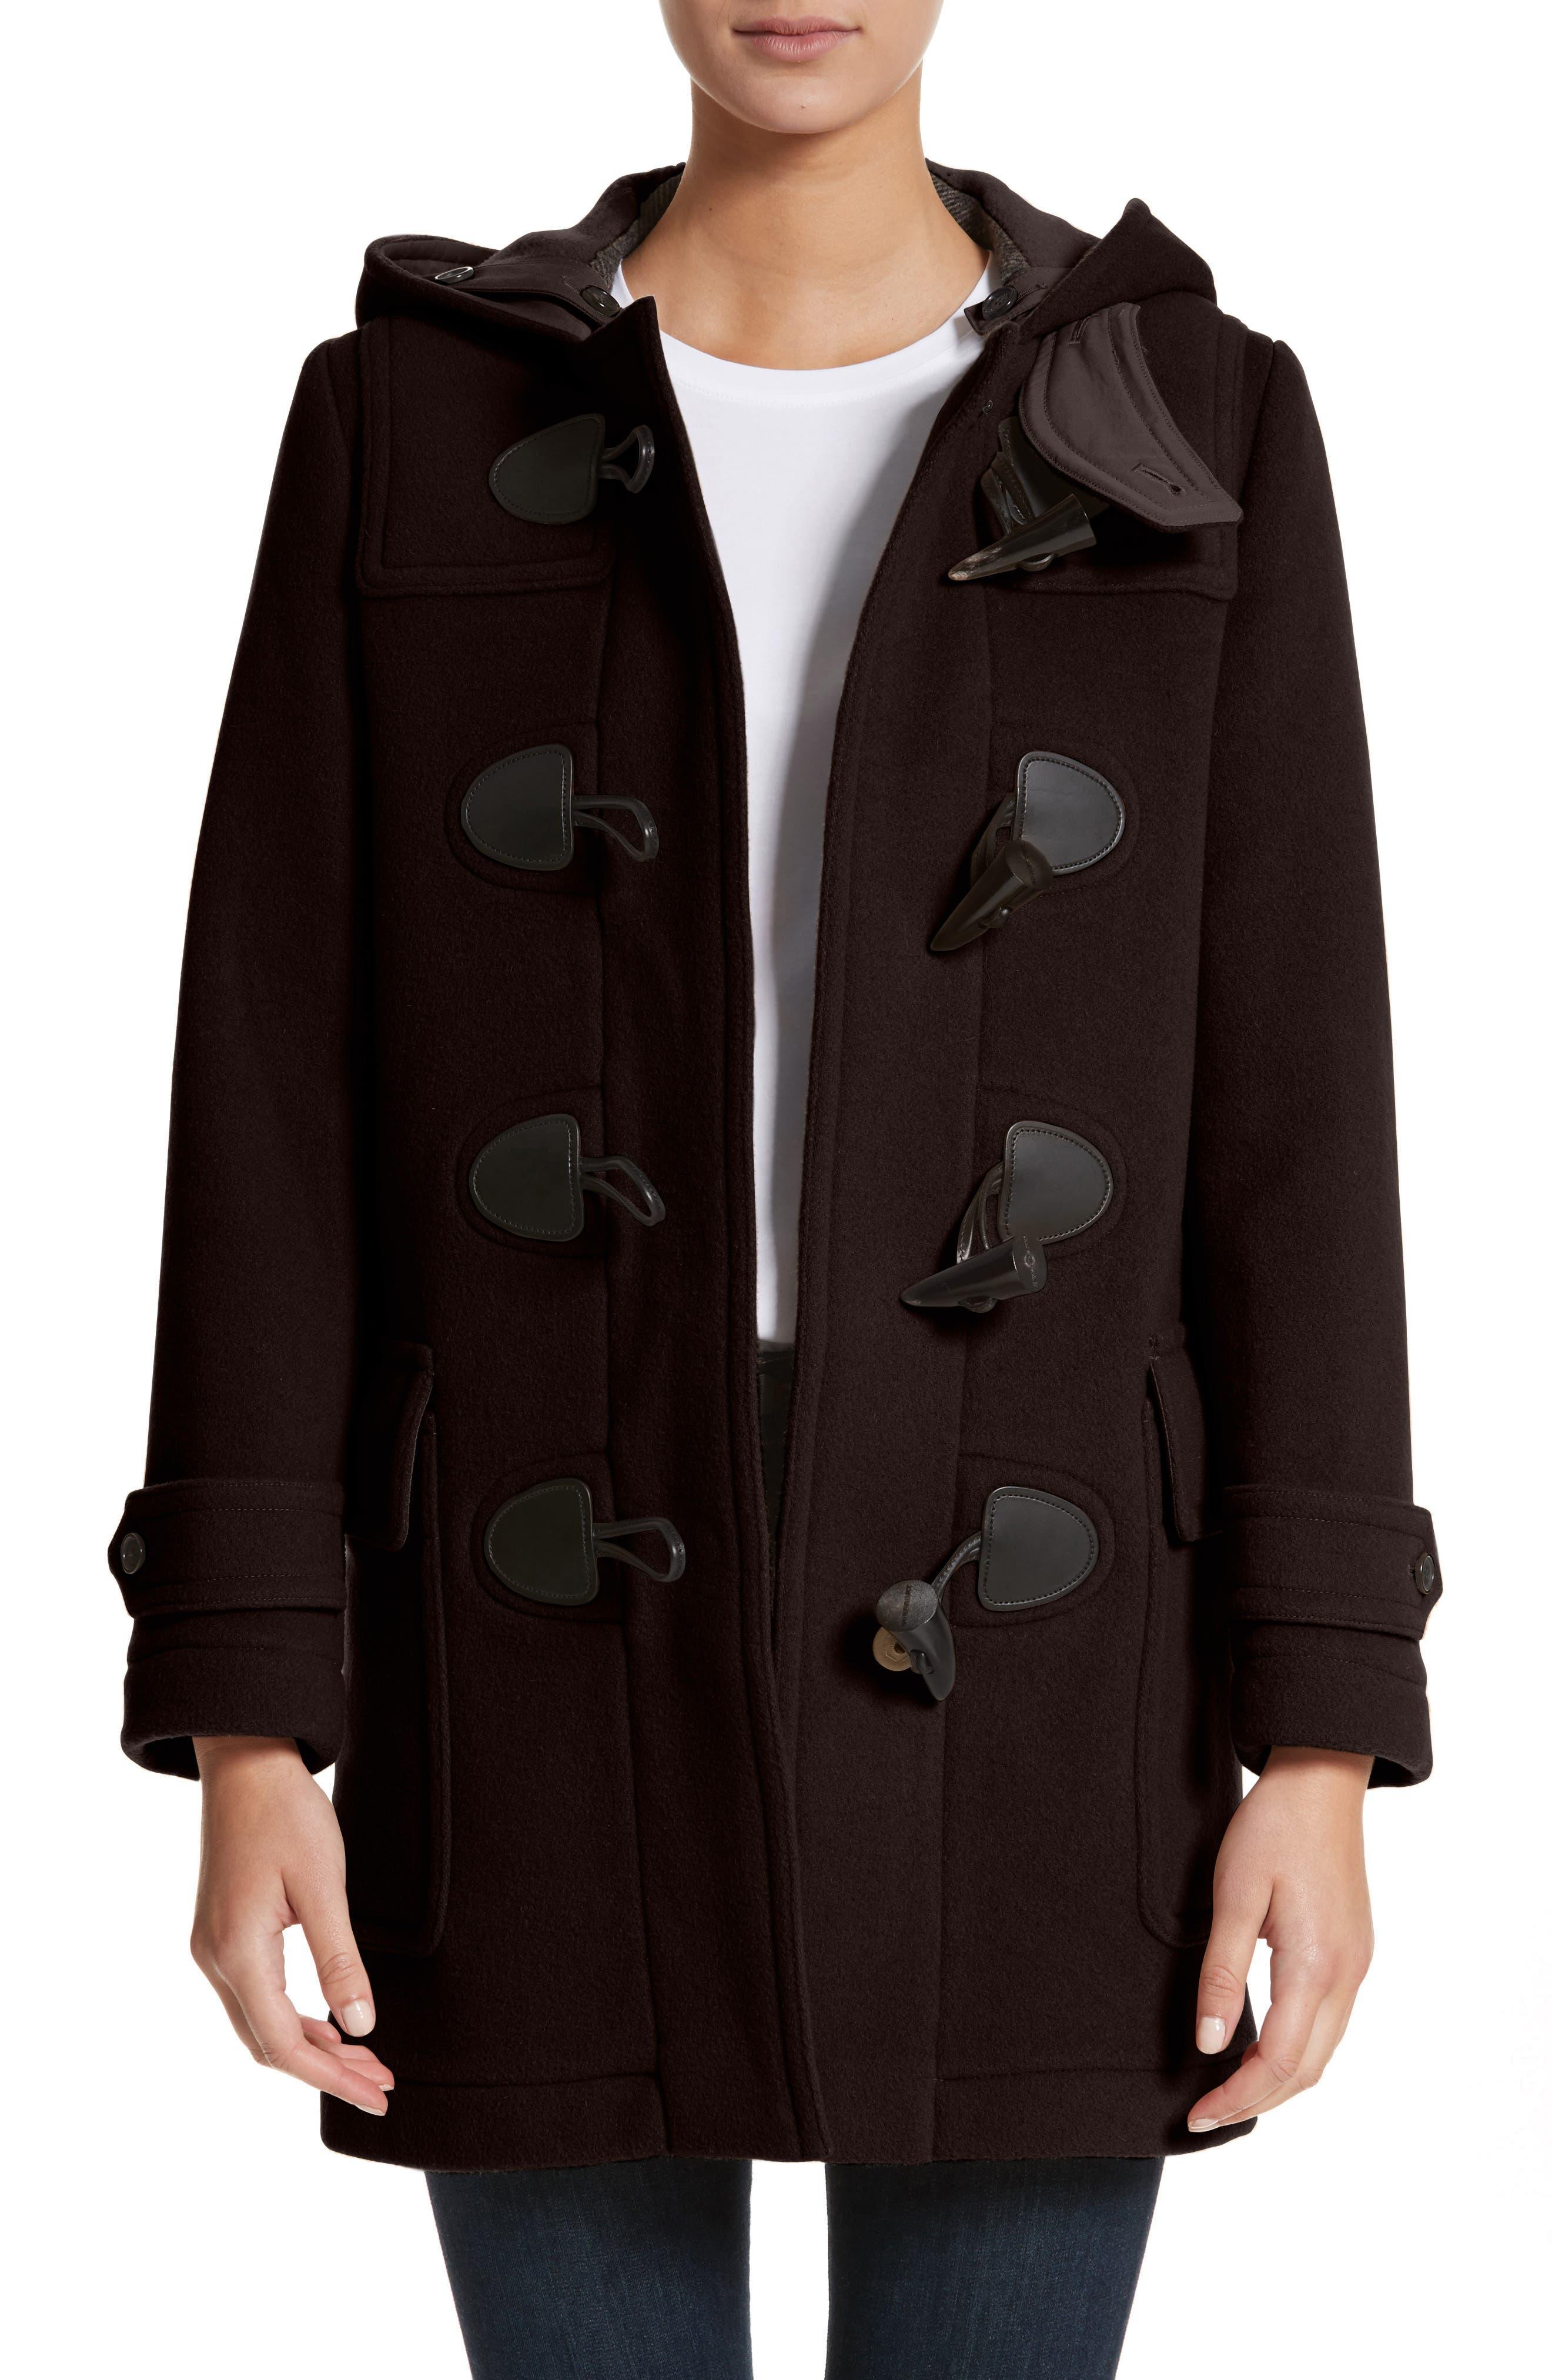 Mersey Wool Blend Duffle Coat,                             Main thumbnail 1, color,                             001